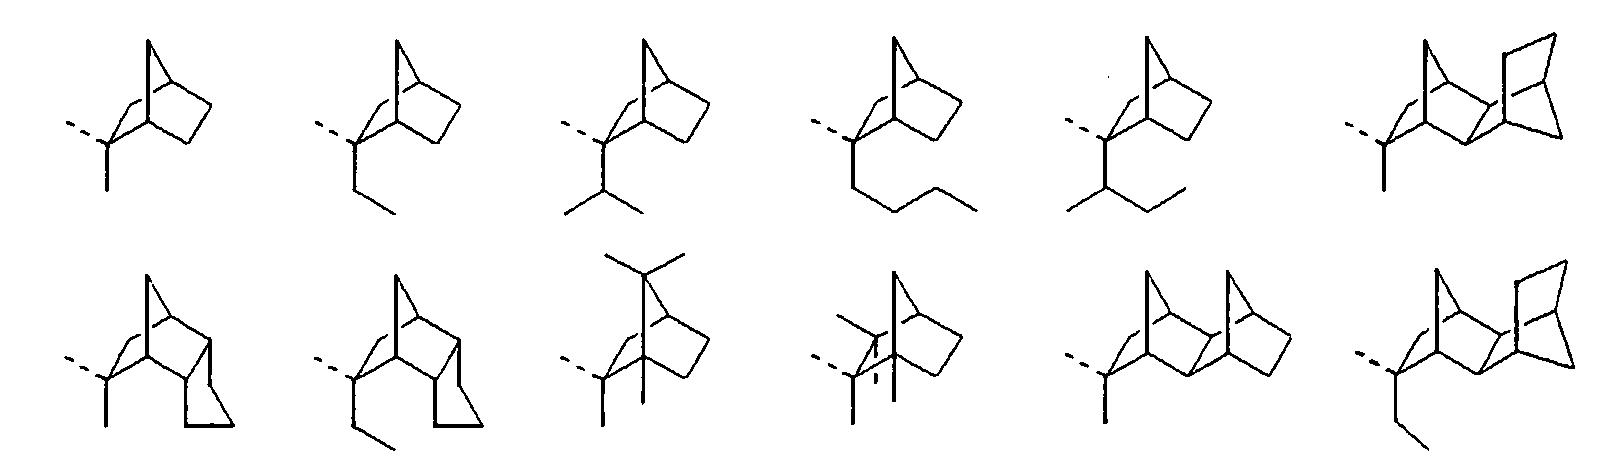 Figure 112002022201306-pat00017